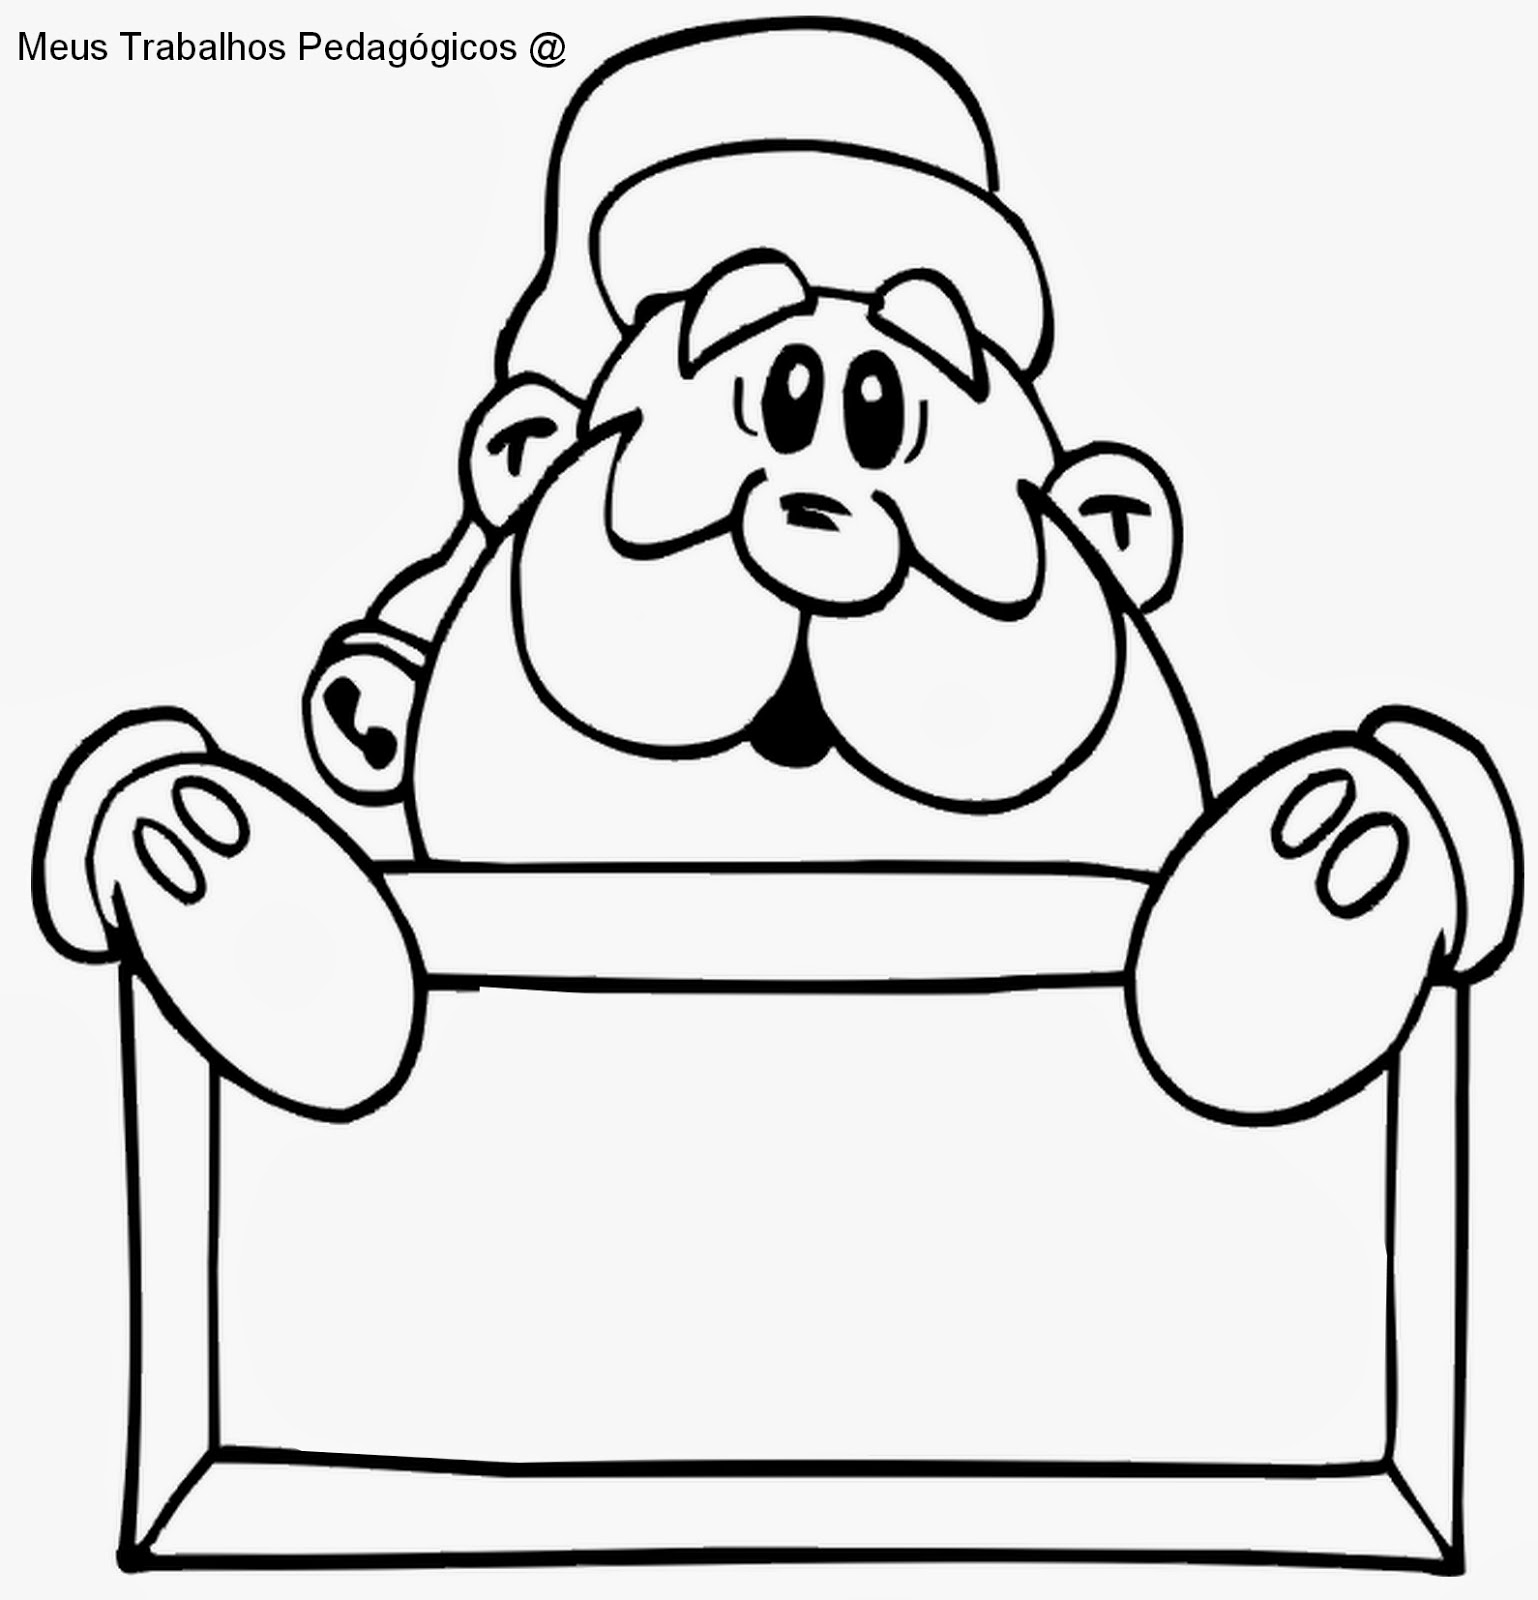 Meus Trabalhos Pedagogicos Papai Noel Para Colorir